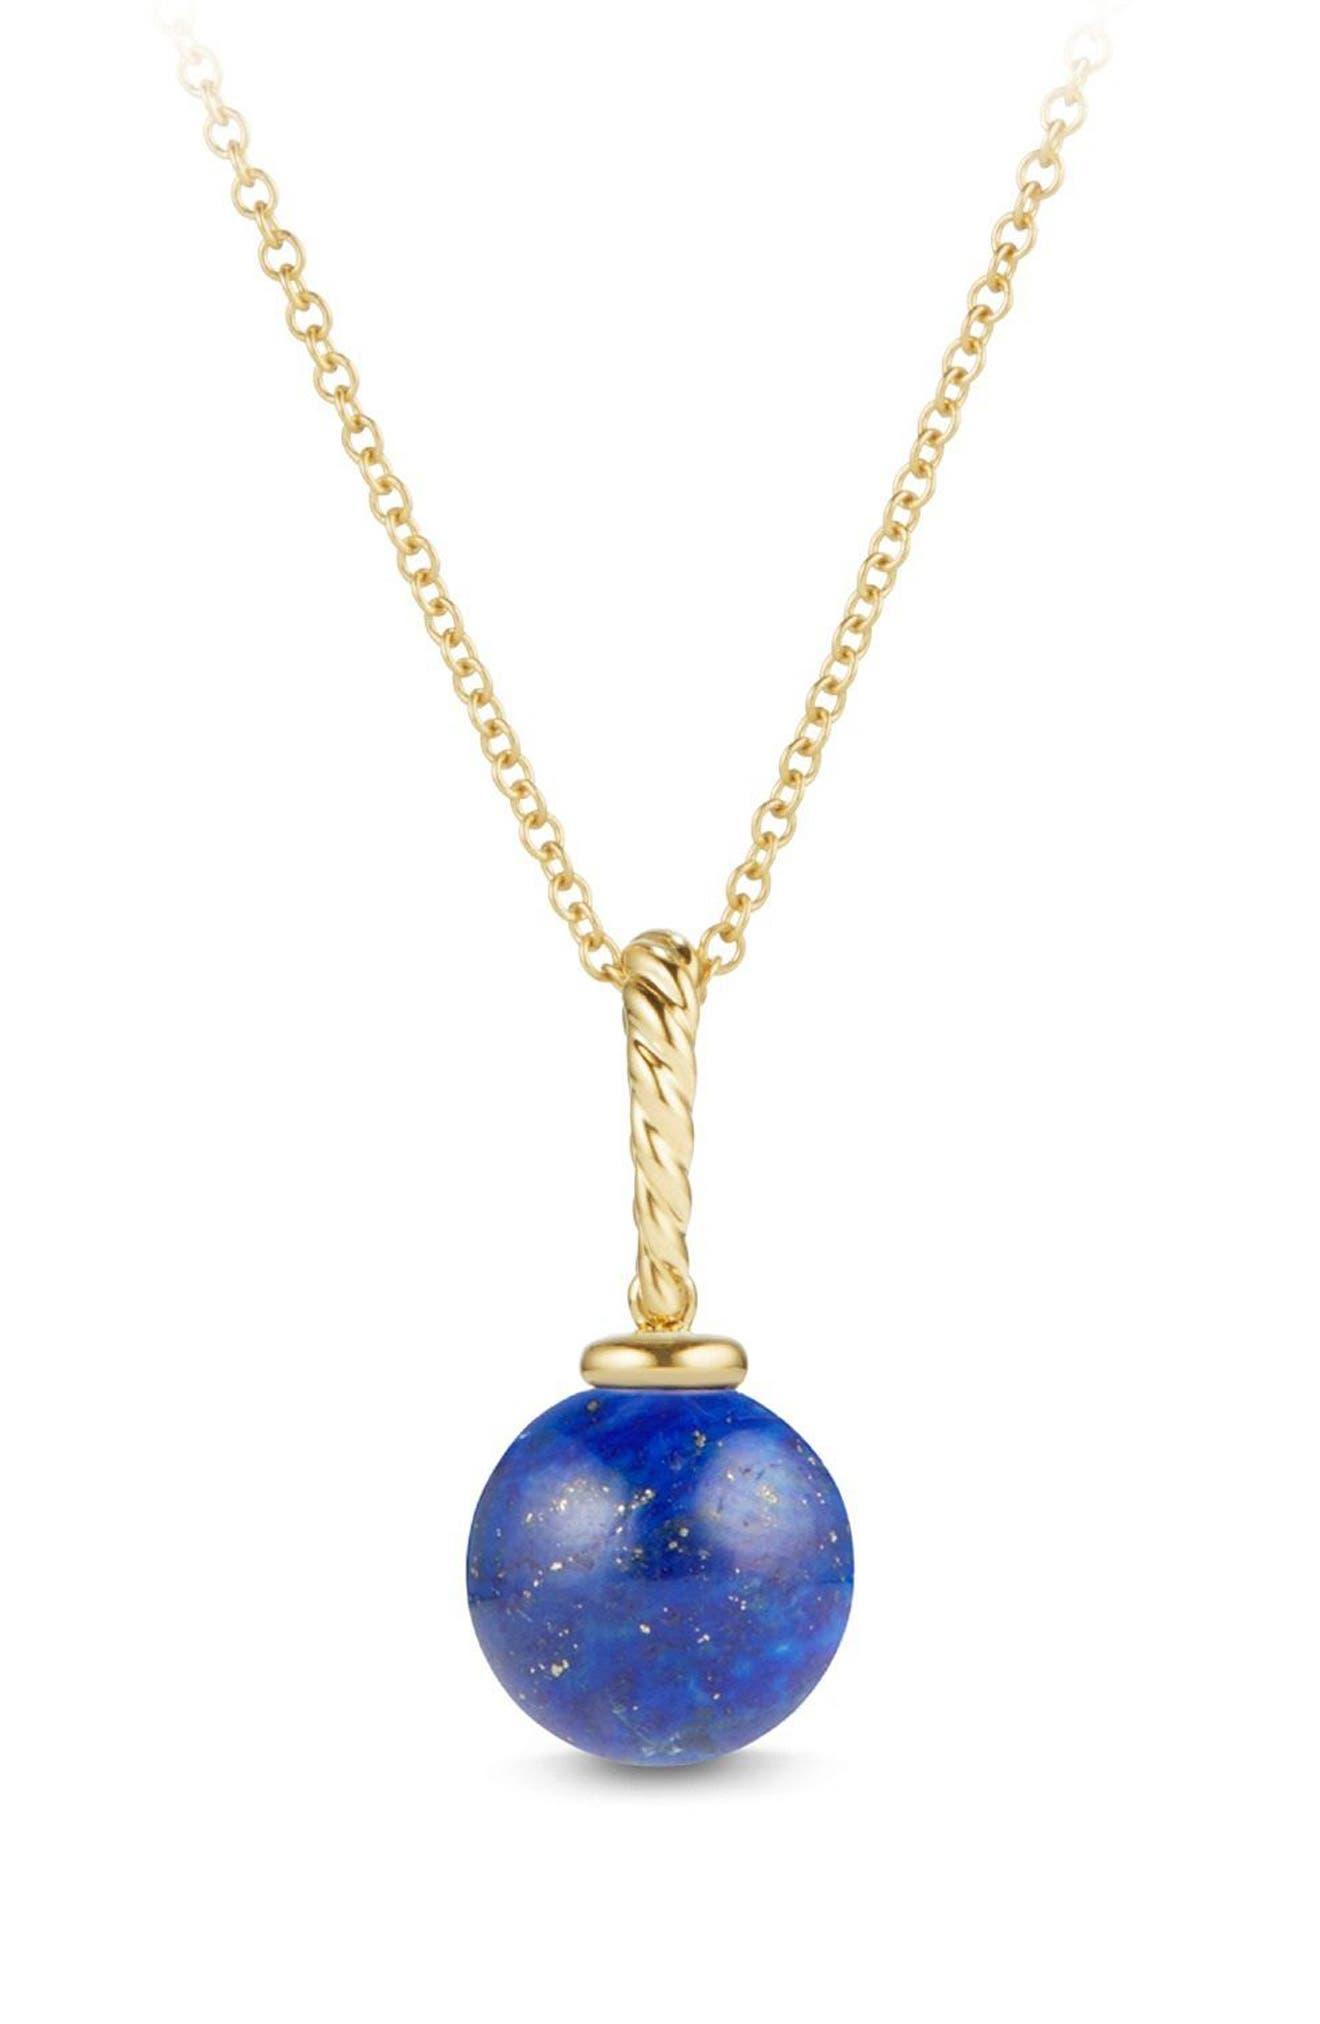 Alternate Image 1 Selected - David Yurman 'Solari' Pendant Necklace in 18K Gold